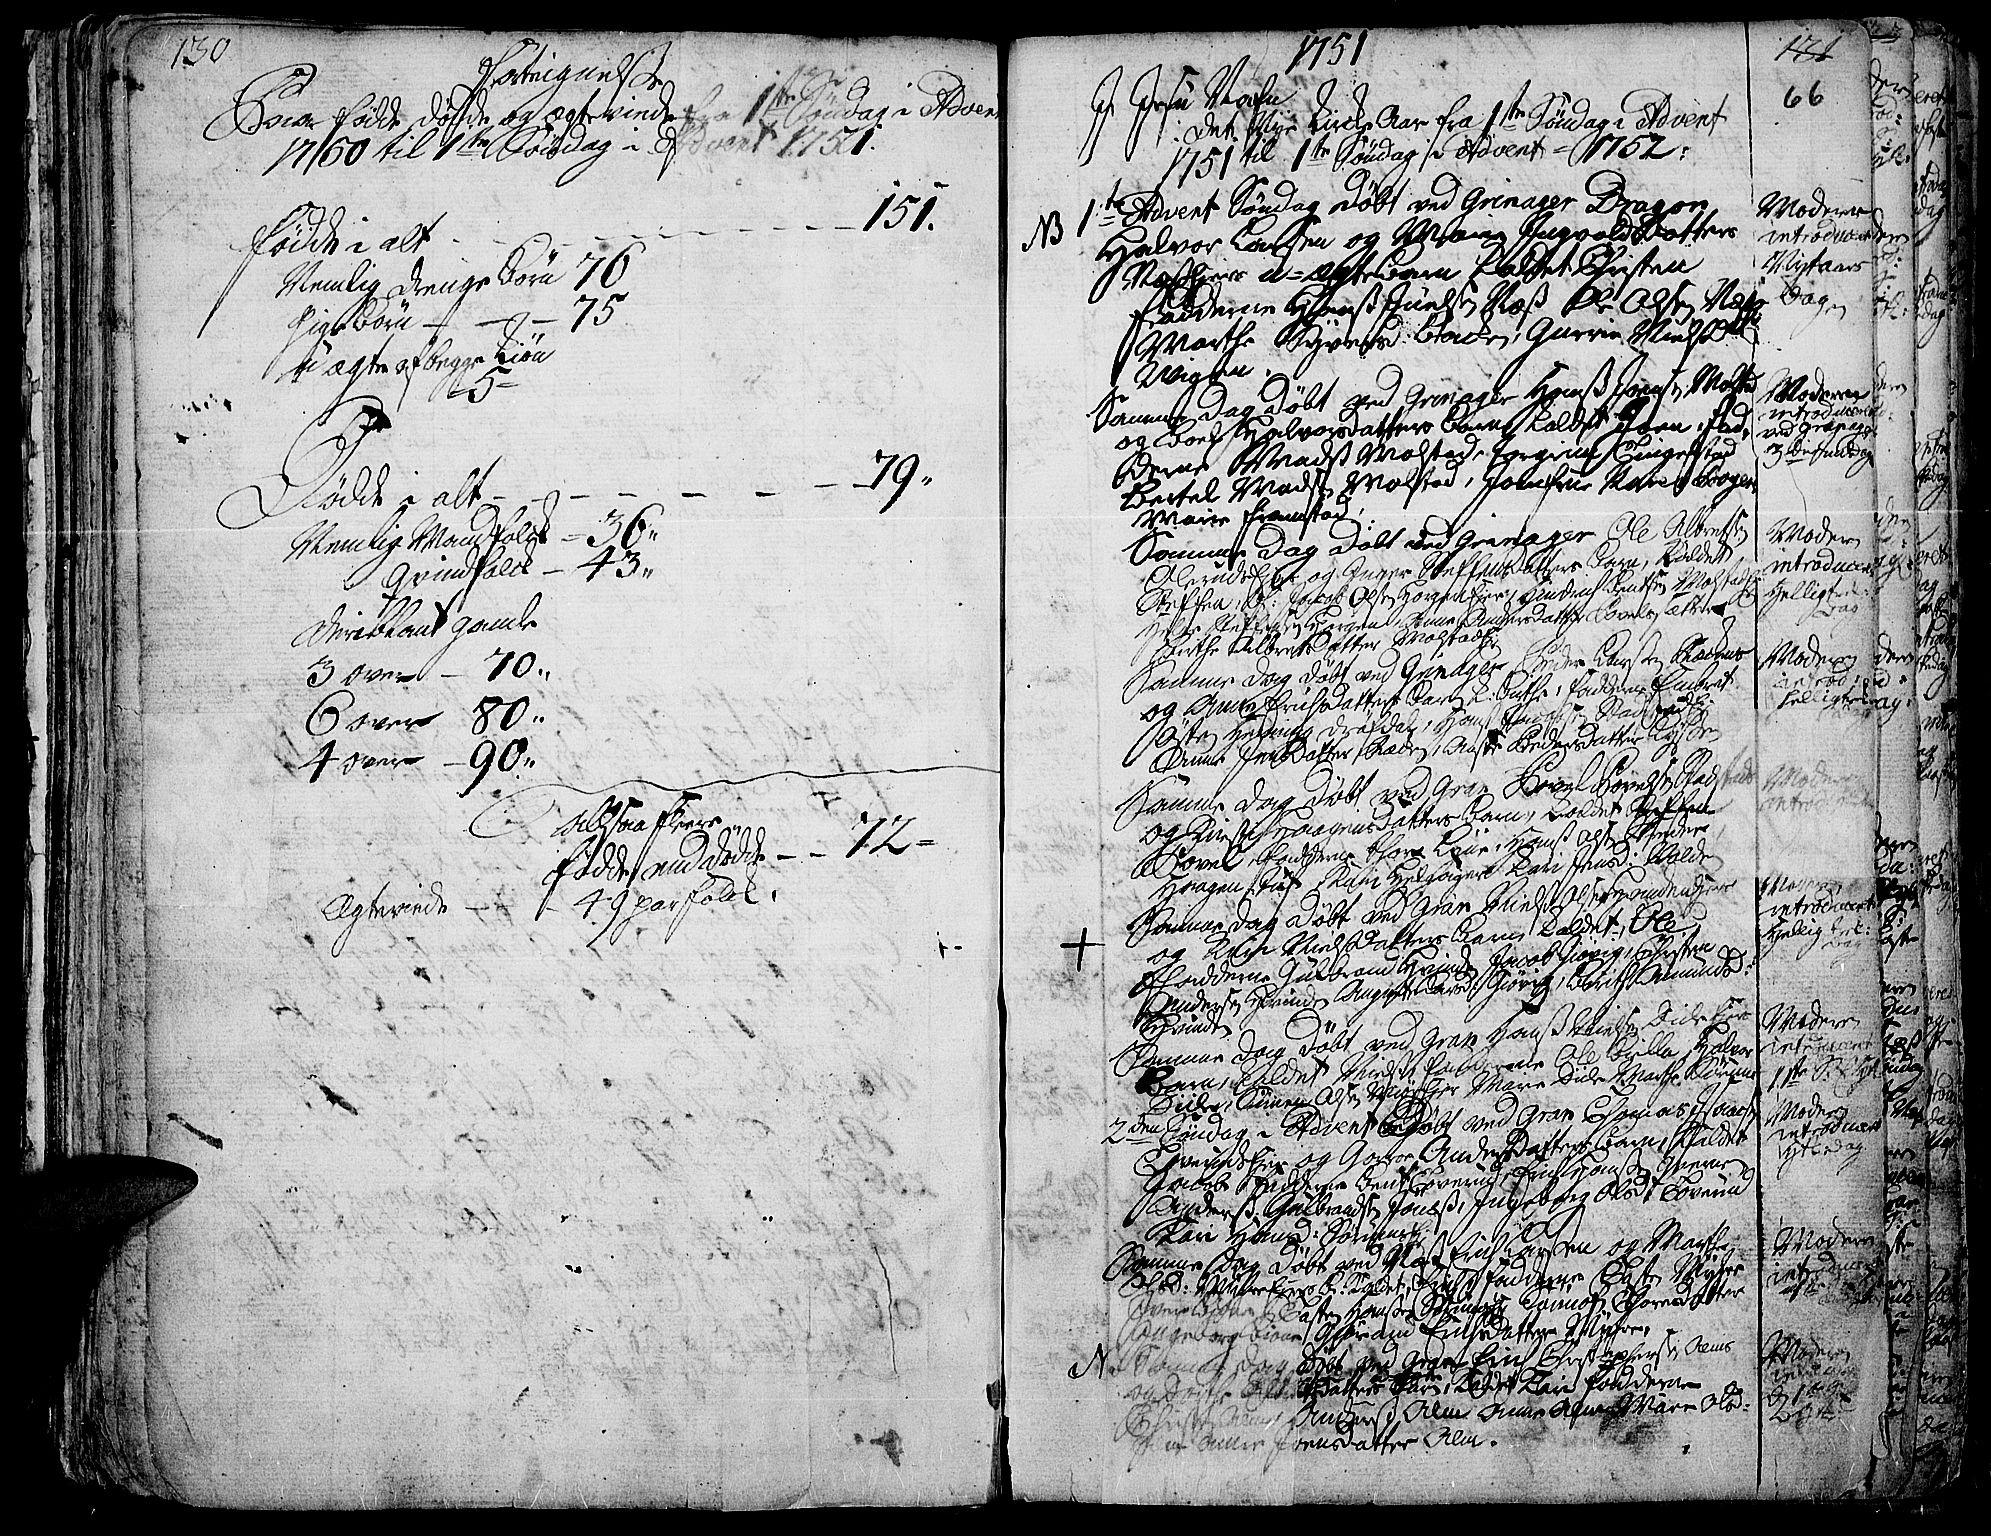 SAH, Gran prestekontor, Ministerialbok nr. 3, 1745-1758, s. 66